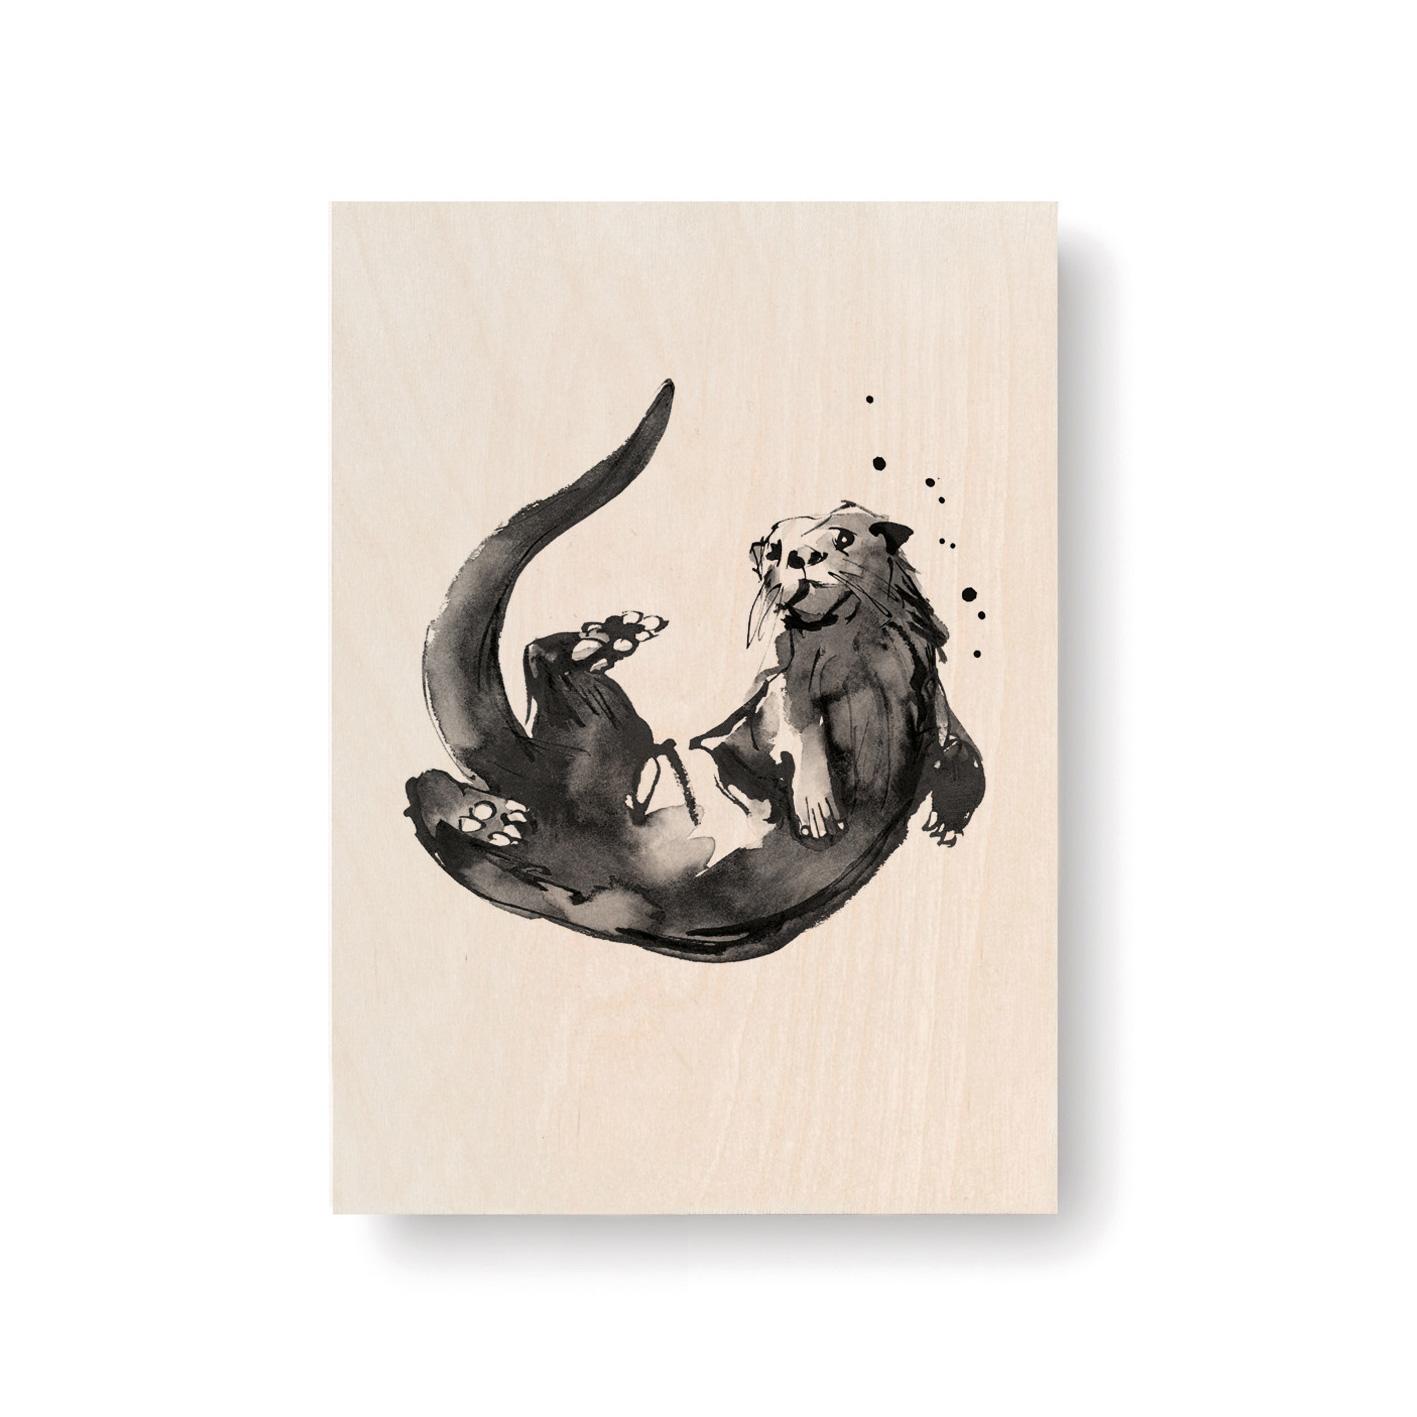 Otter plywood art card